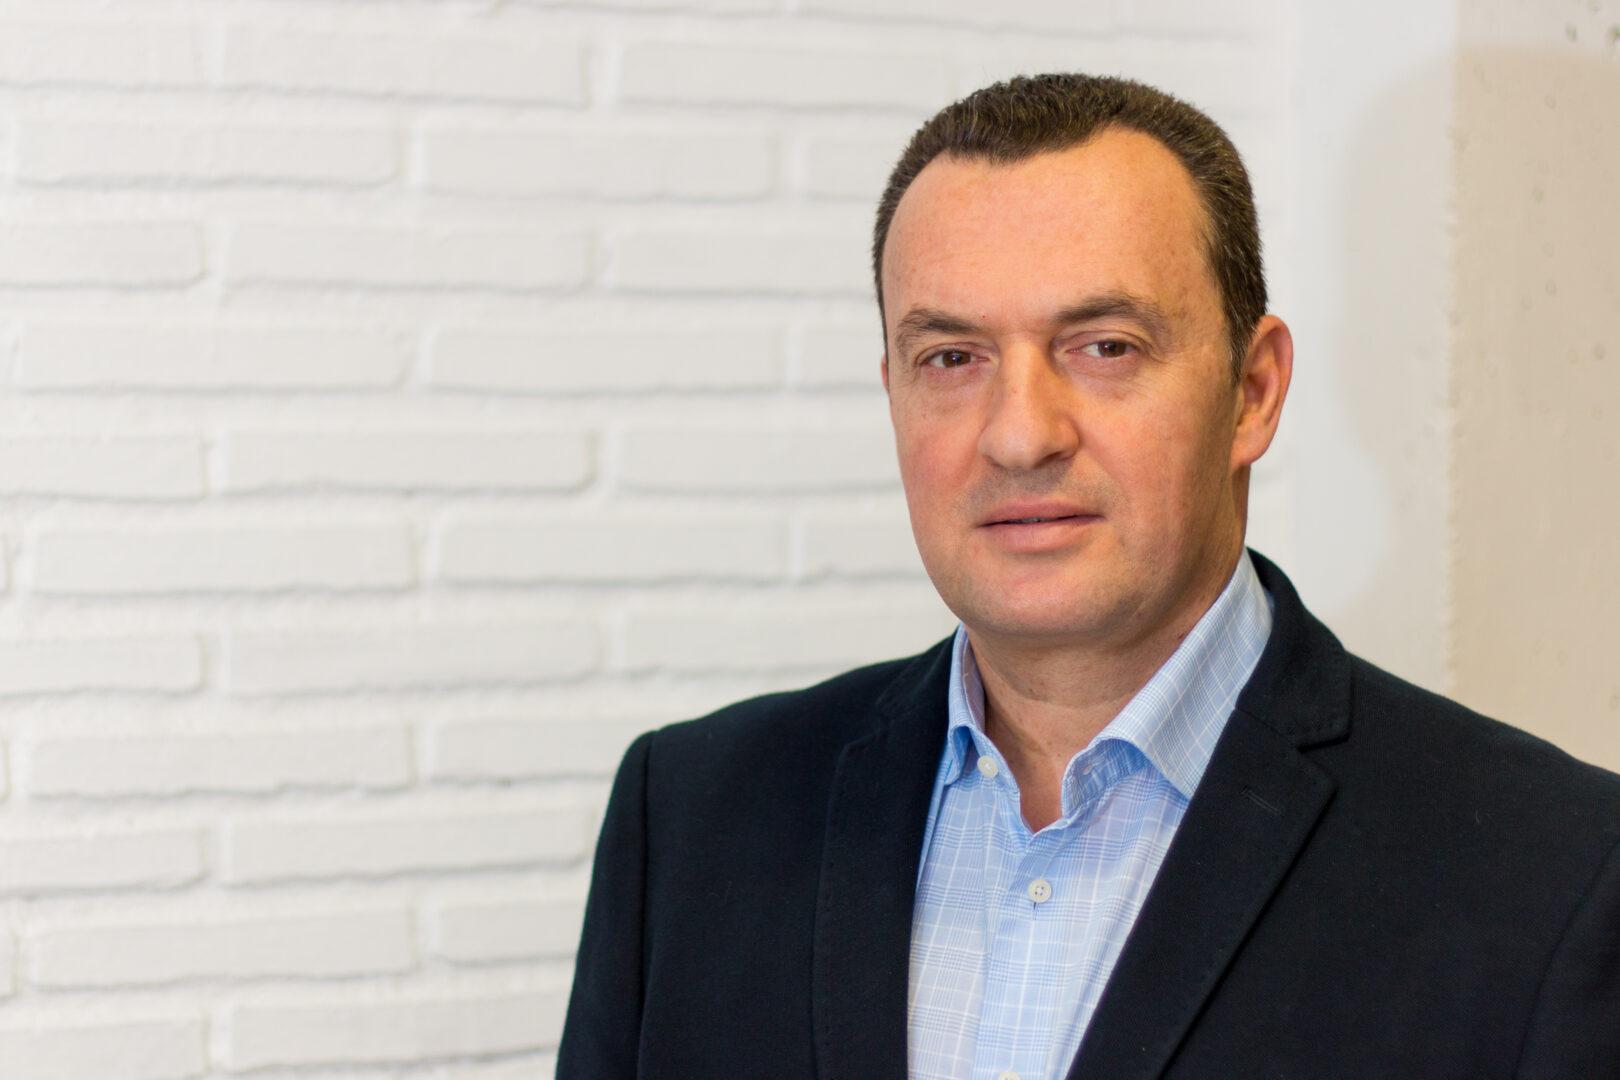 Dr. Santiago Merino Grande